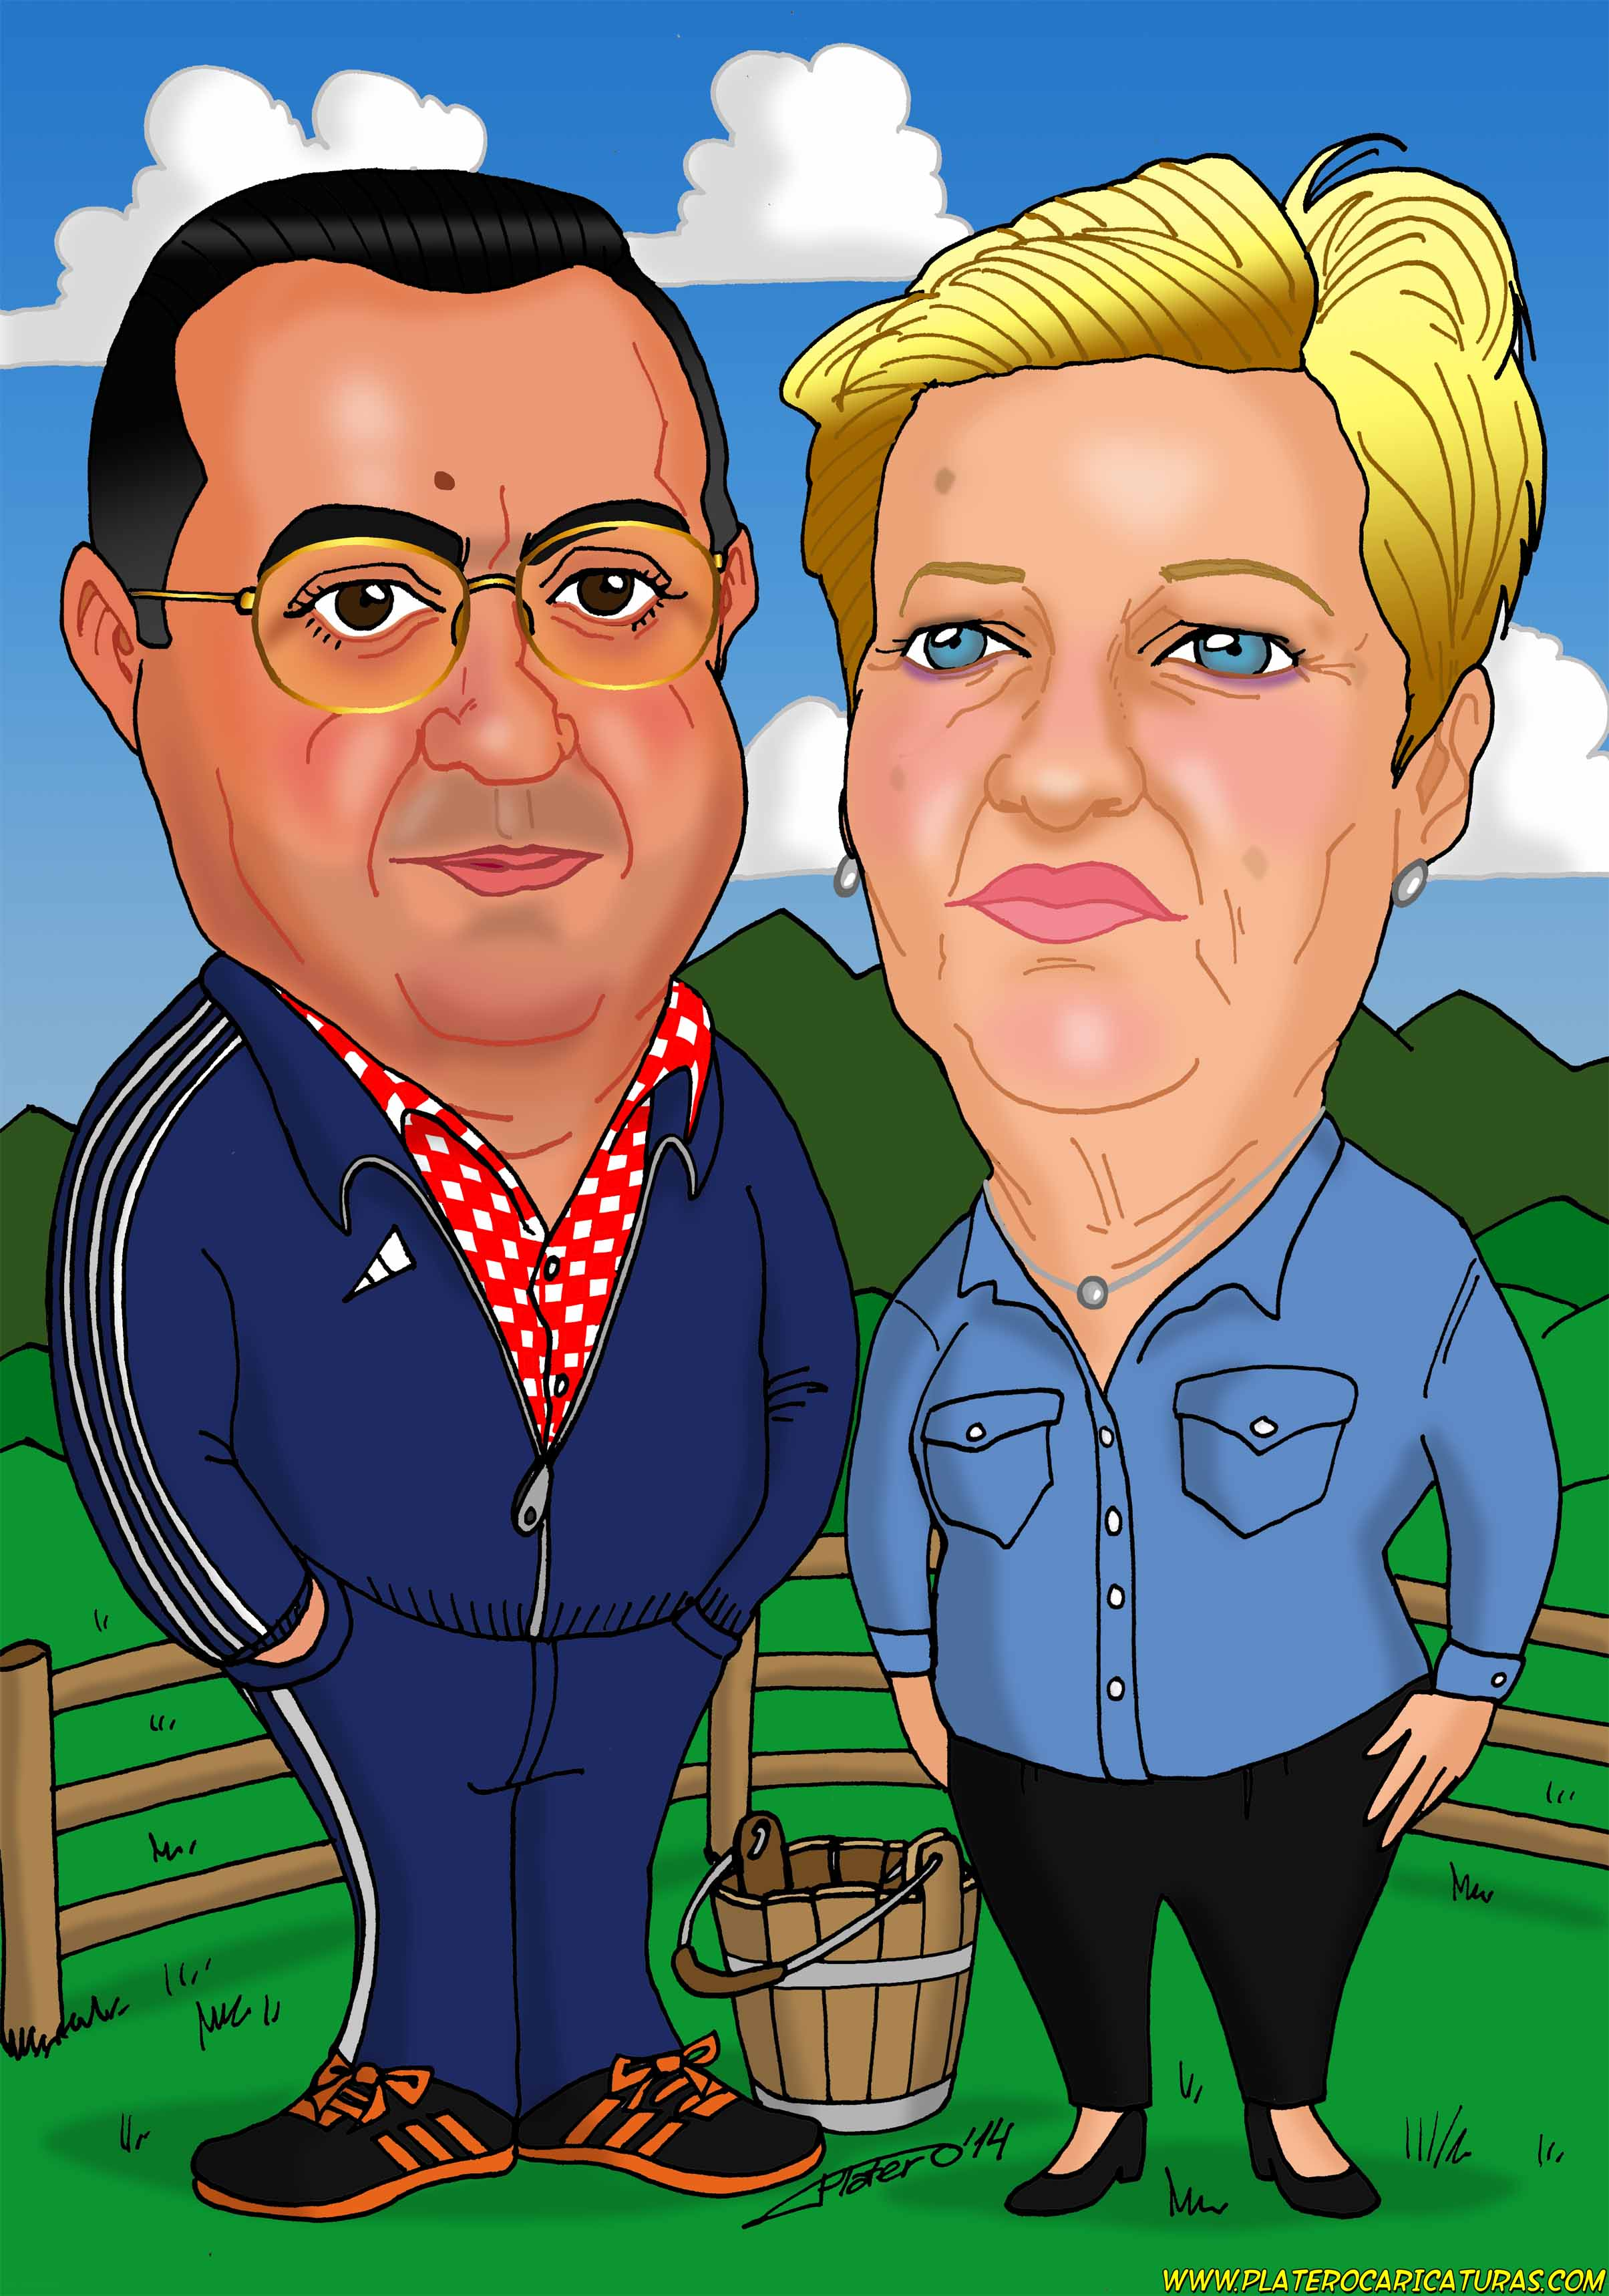 caricaturas a color por encargo personalizadas_abuelos Asturias_platerocaricatur